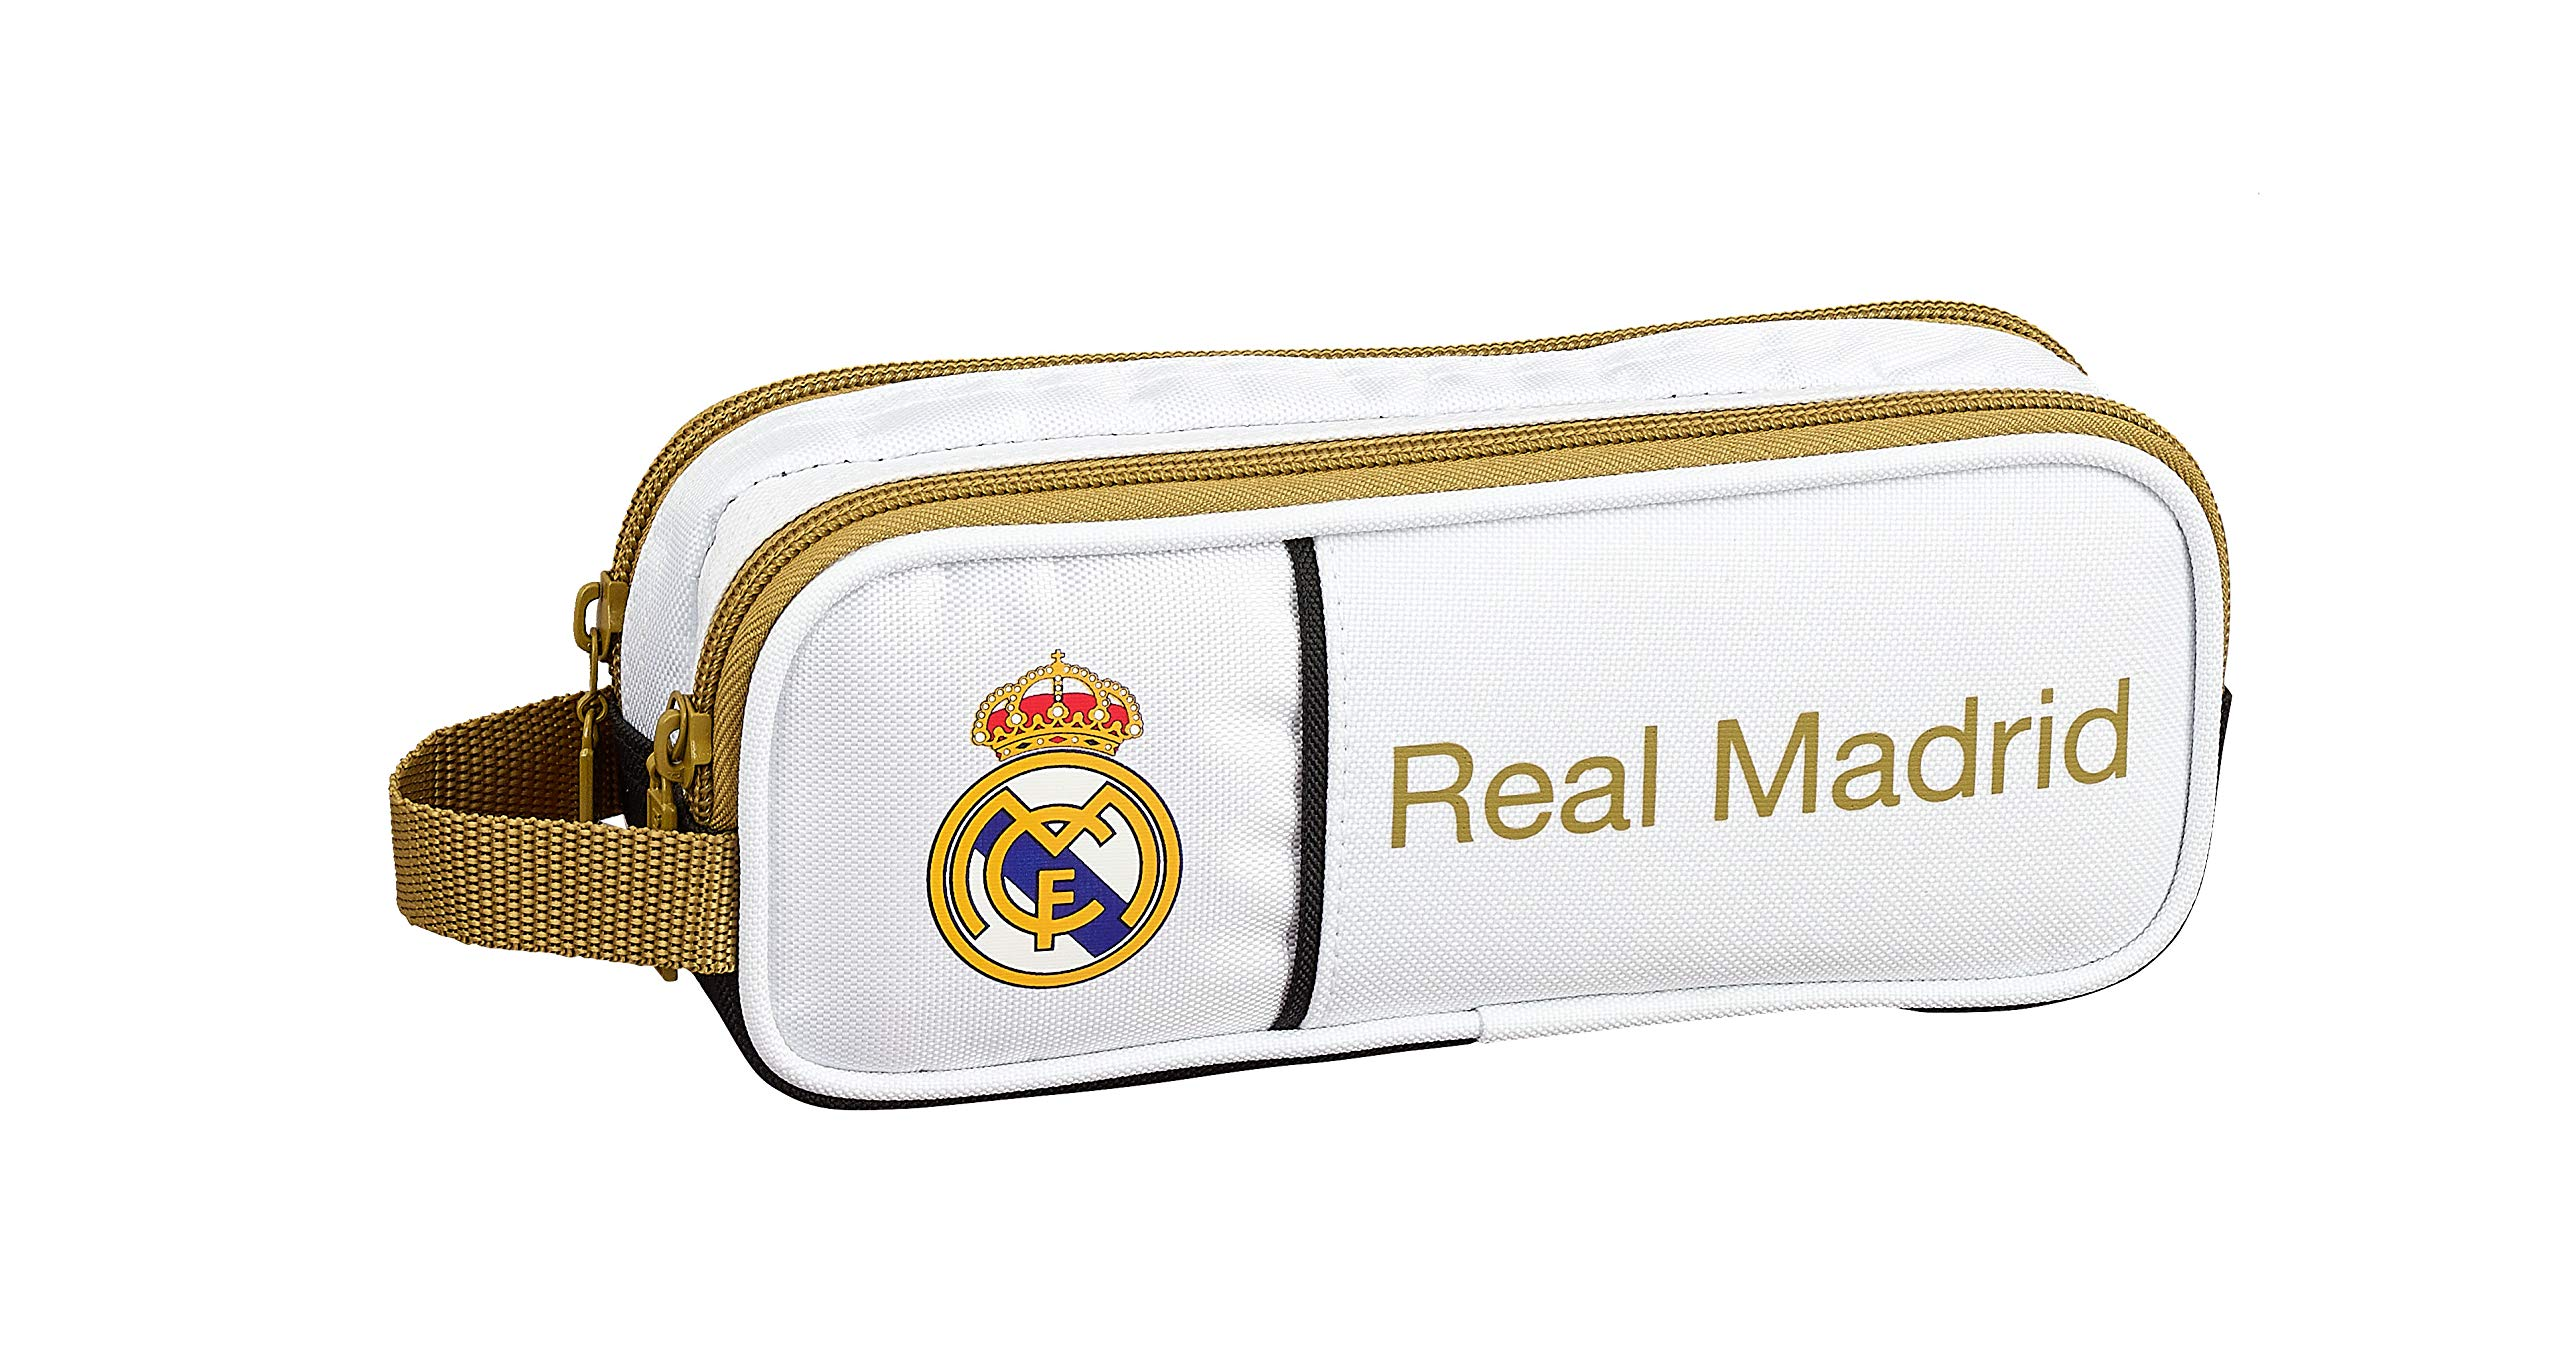 Real Madrid CF Estuche portatodo Doble 2 Cremalleras Escolar